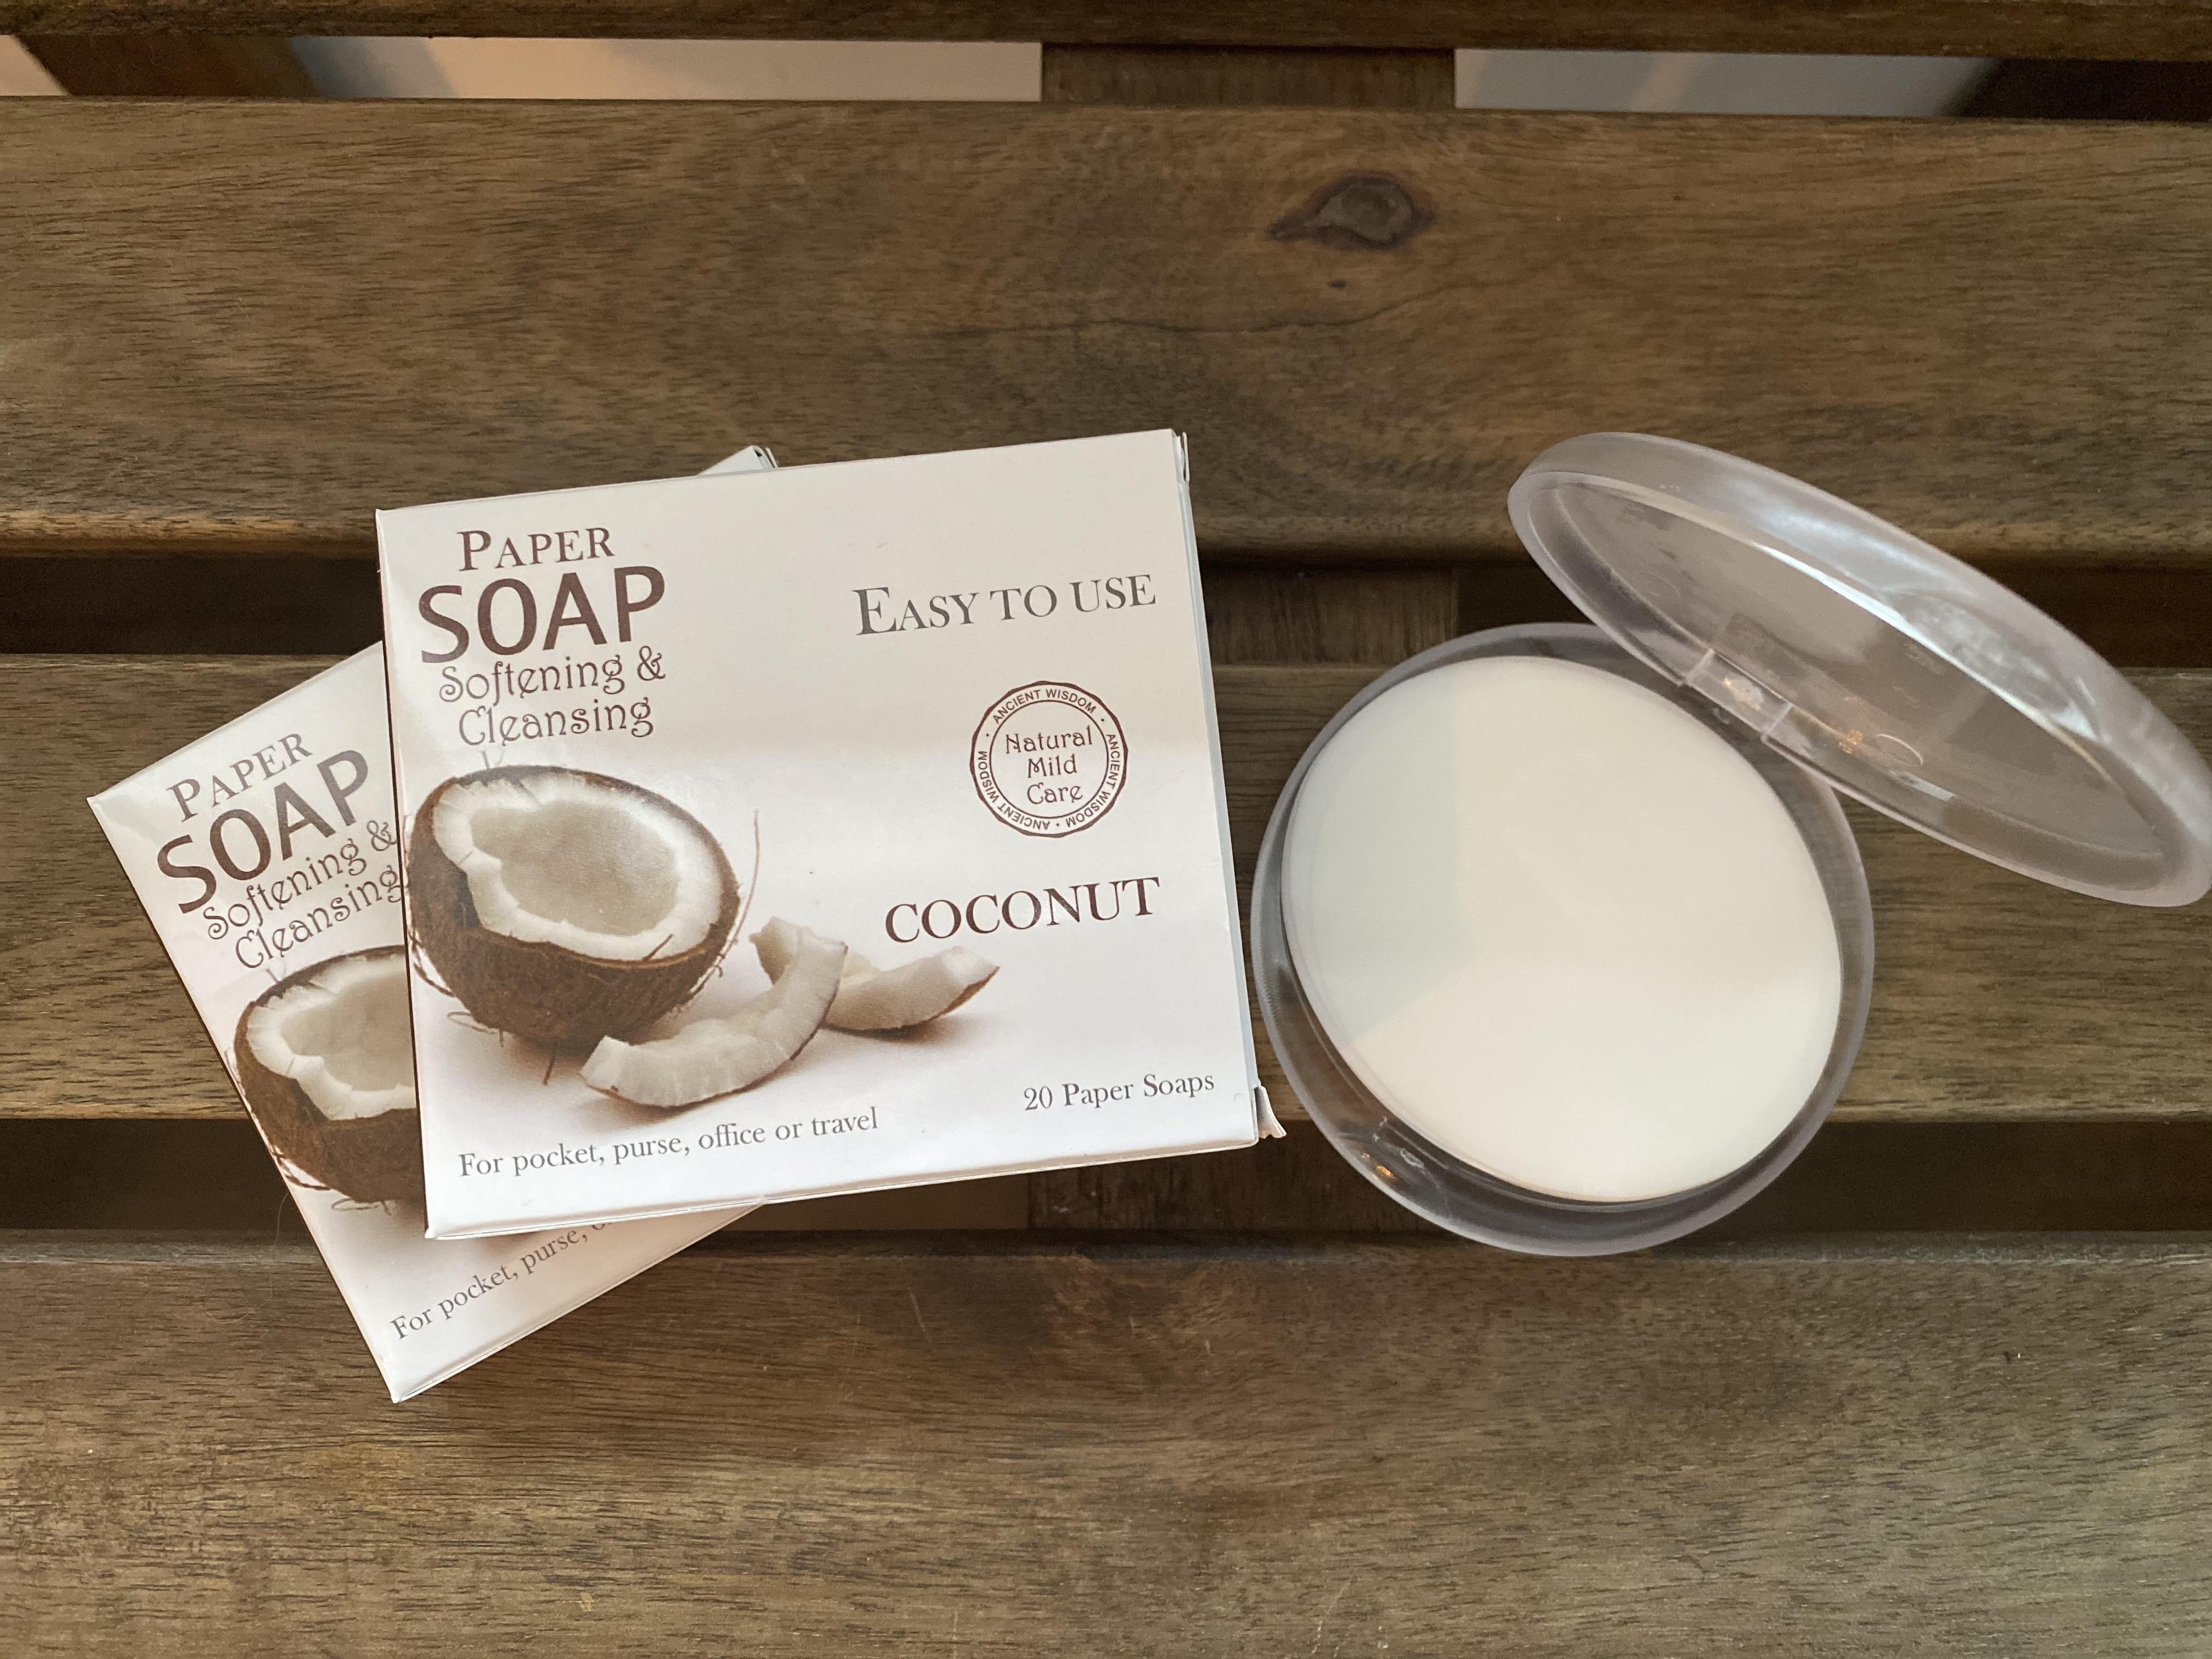 Paper Soap Coconut